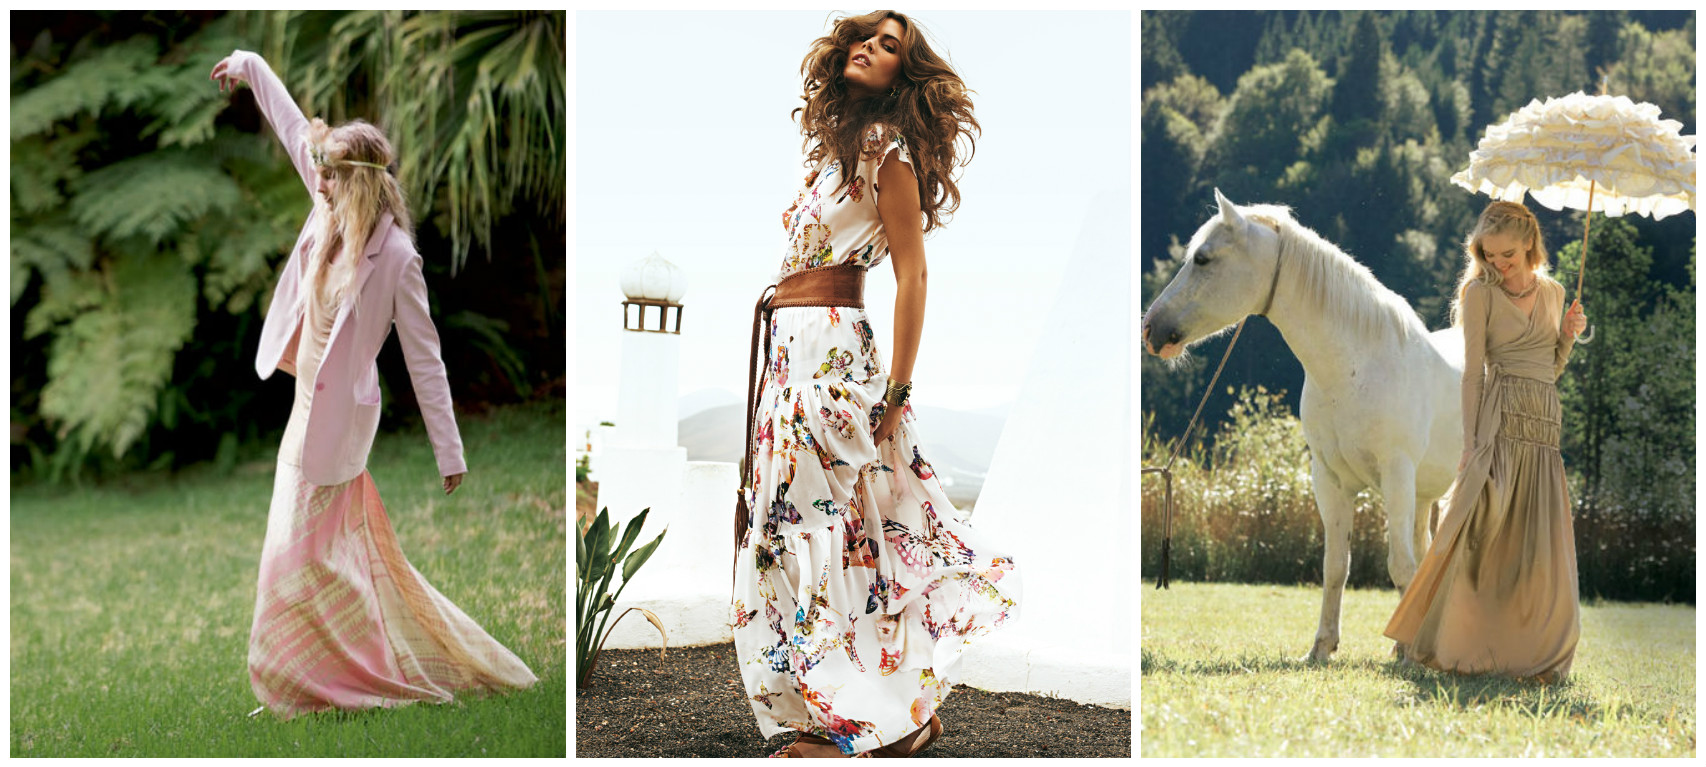 30 модных юбок налето 2016